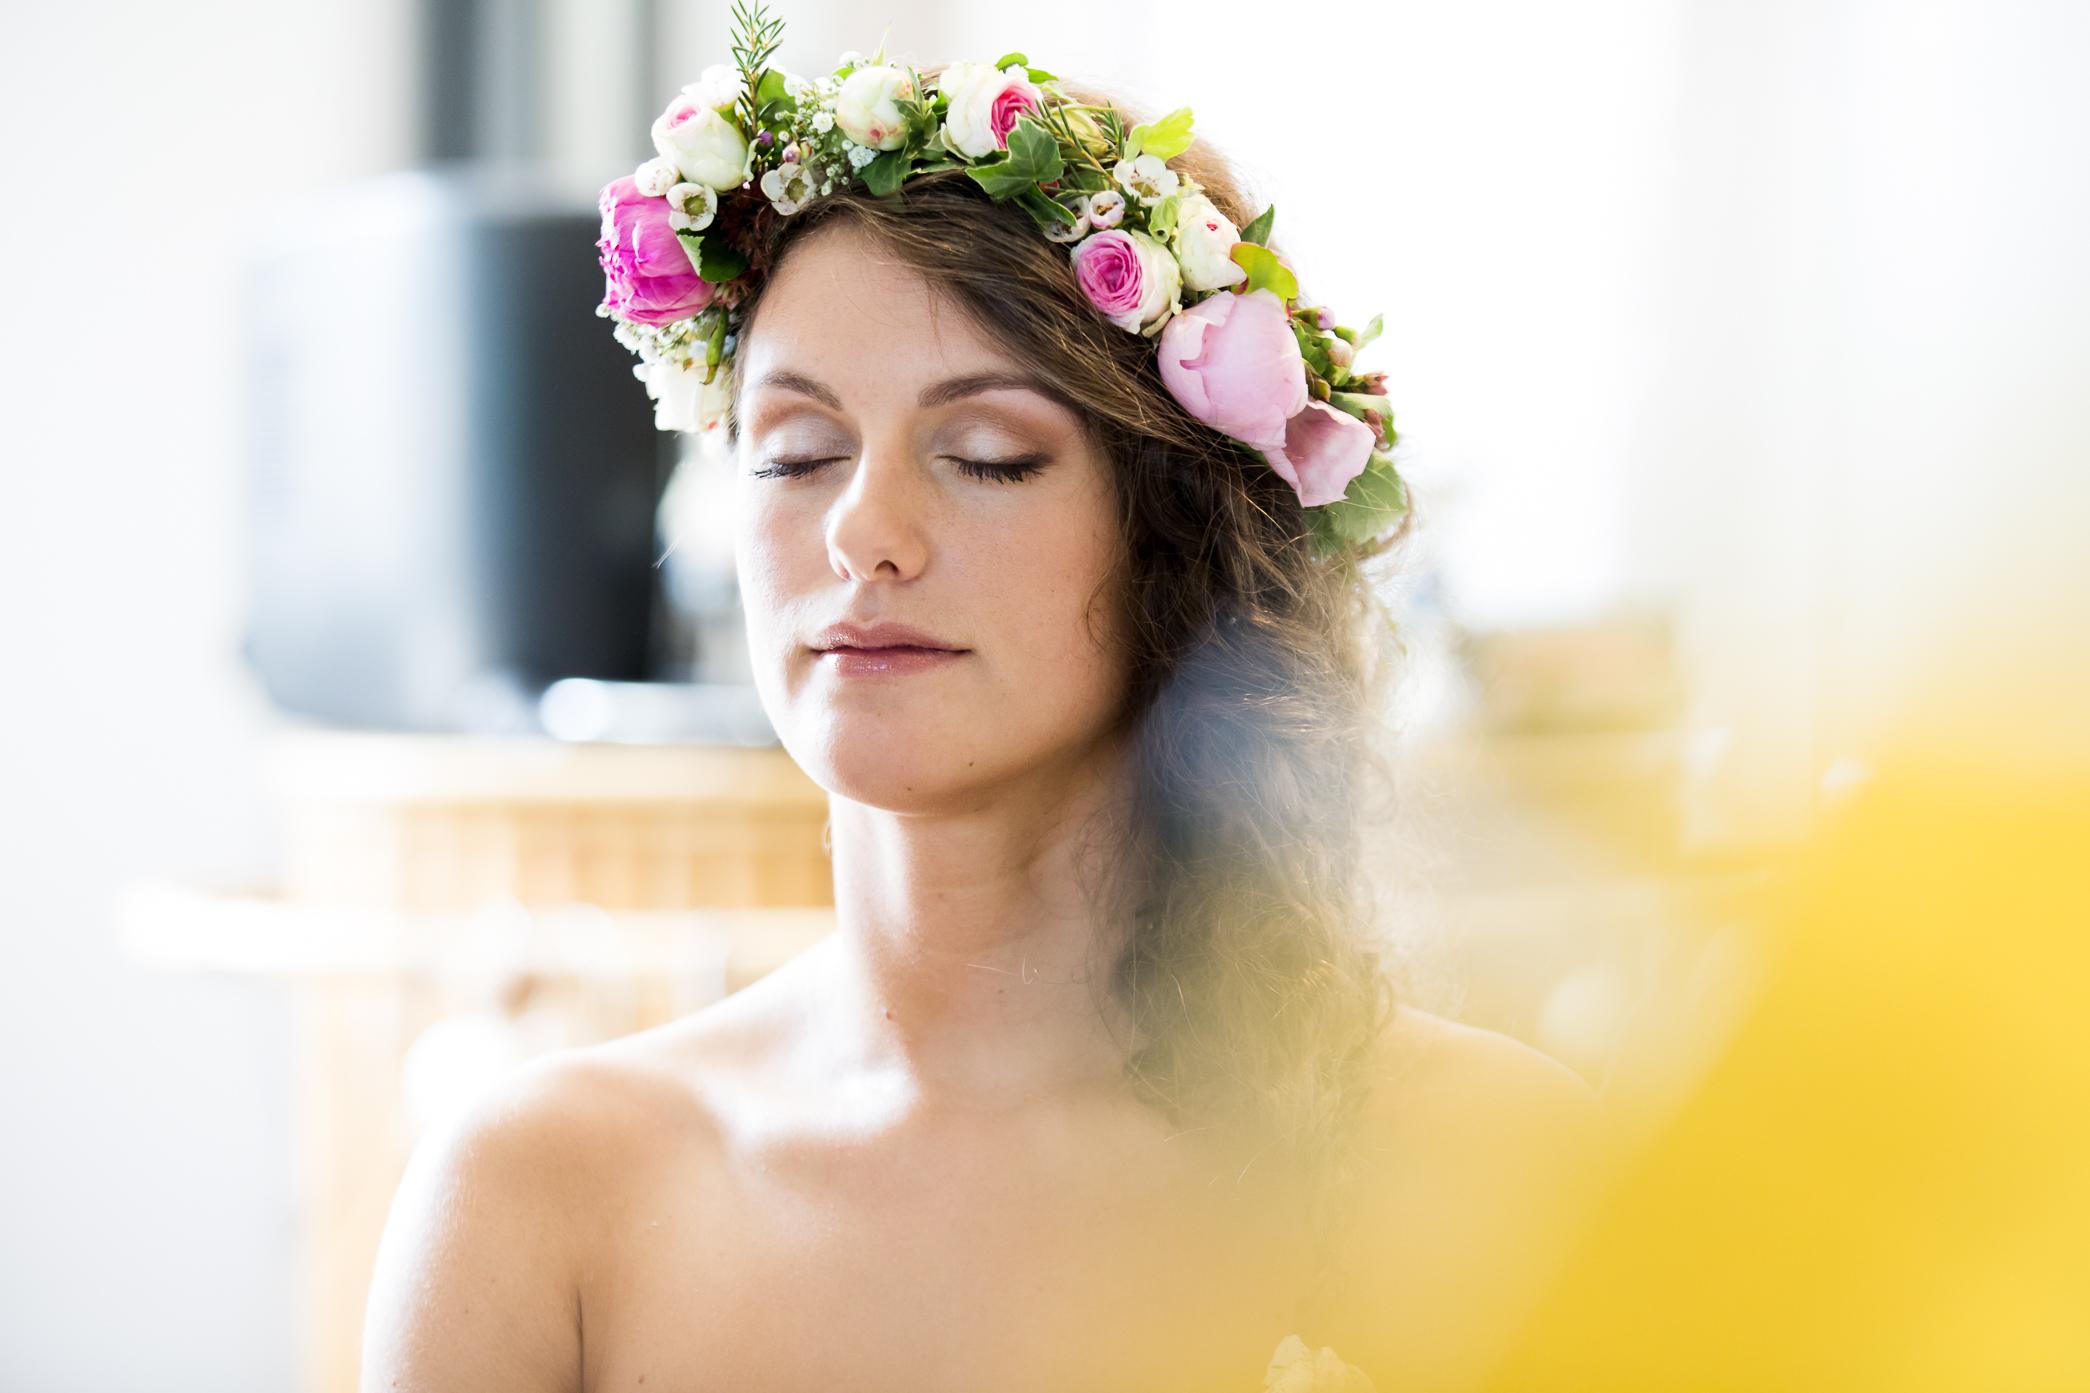 photographe-mariage-oise-clos-barisseuse-senlis-lamorlaye-gouvieux-keith-flament-5